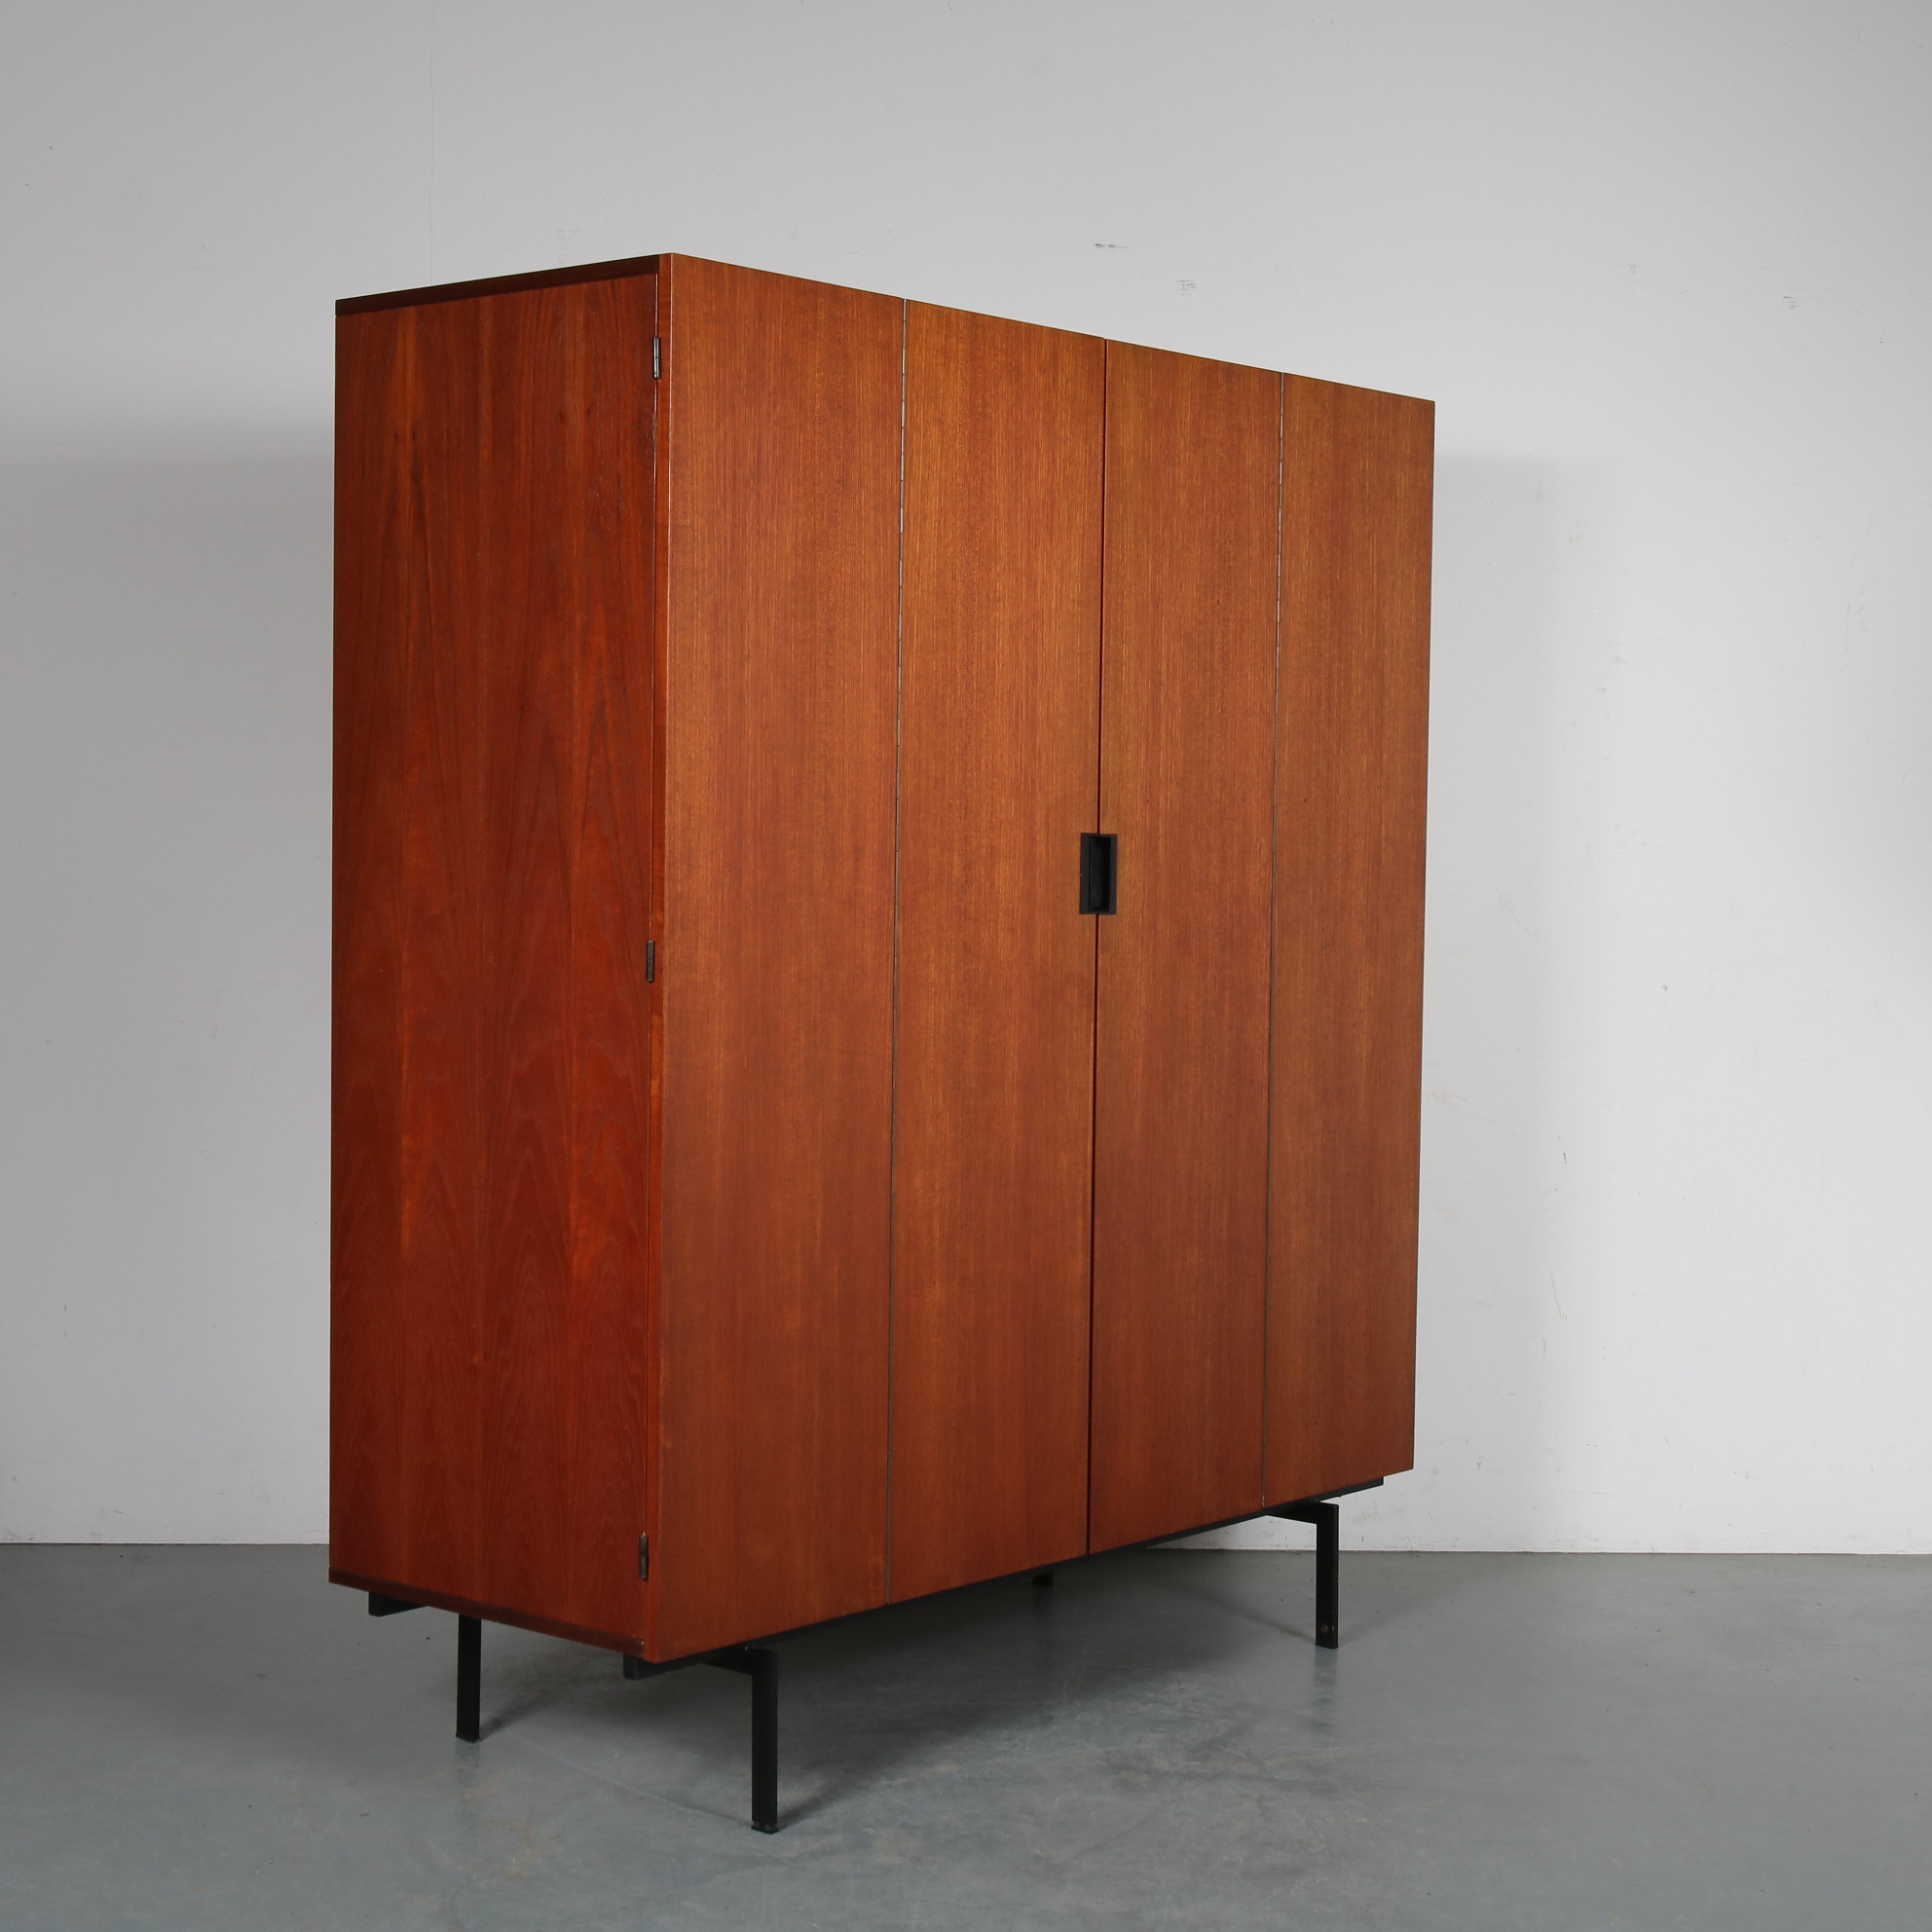 m23795 1950s Wardrobe from the Japanese series Cees Braakman Pastoe / Netherlands